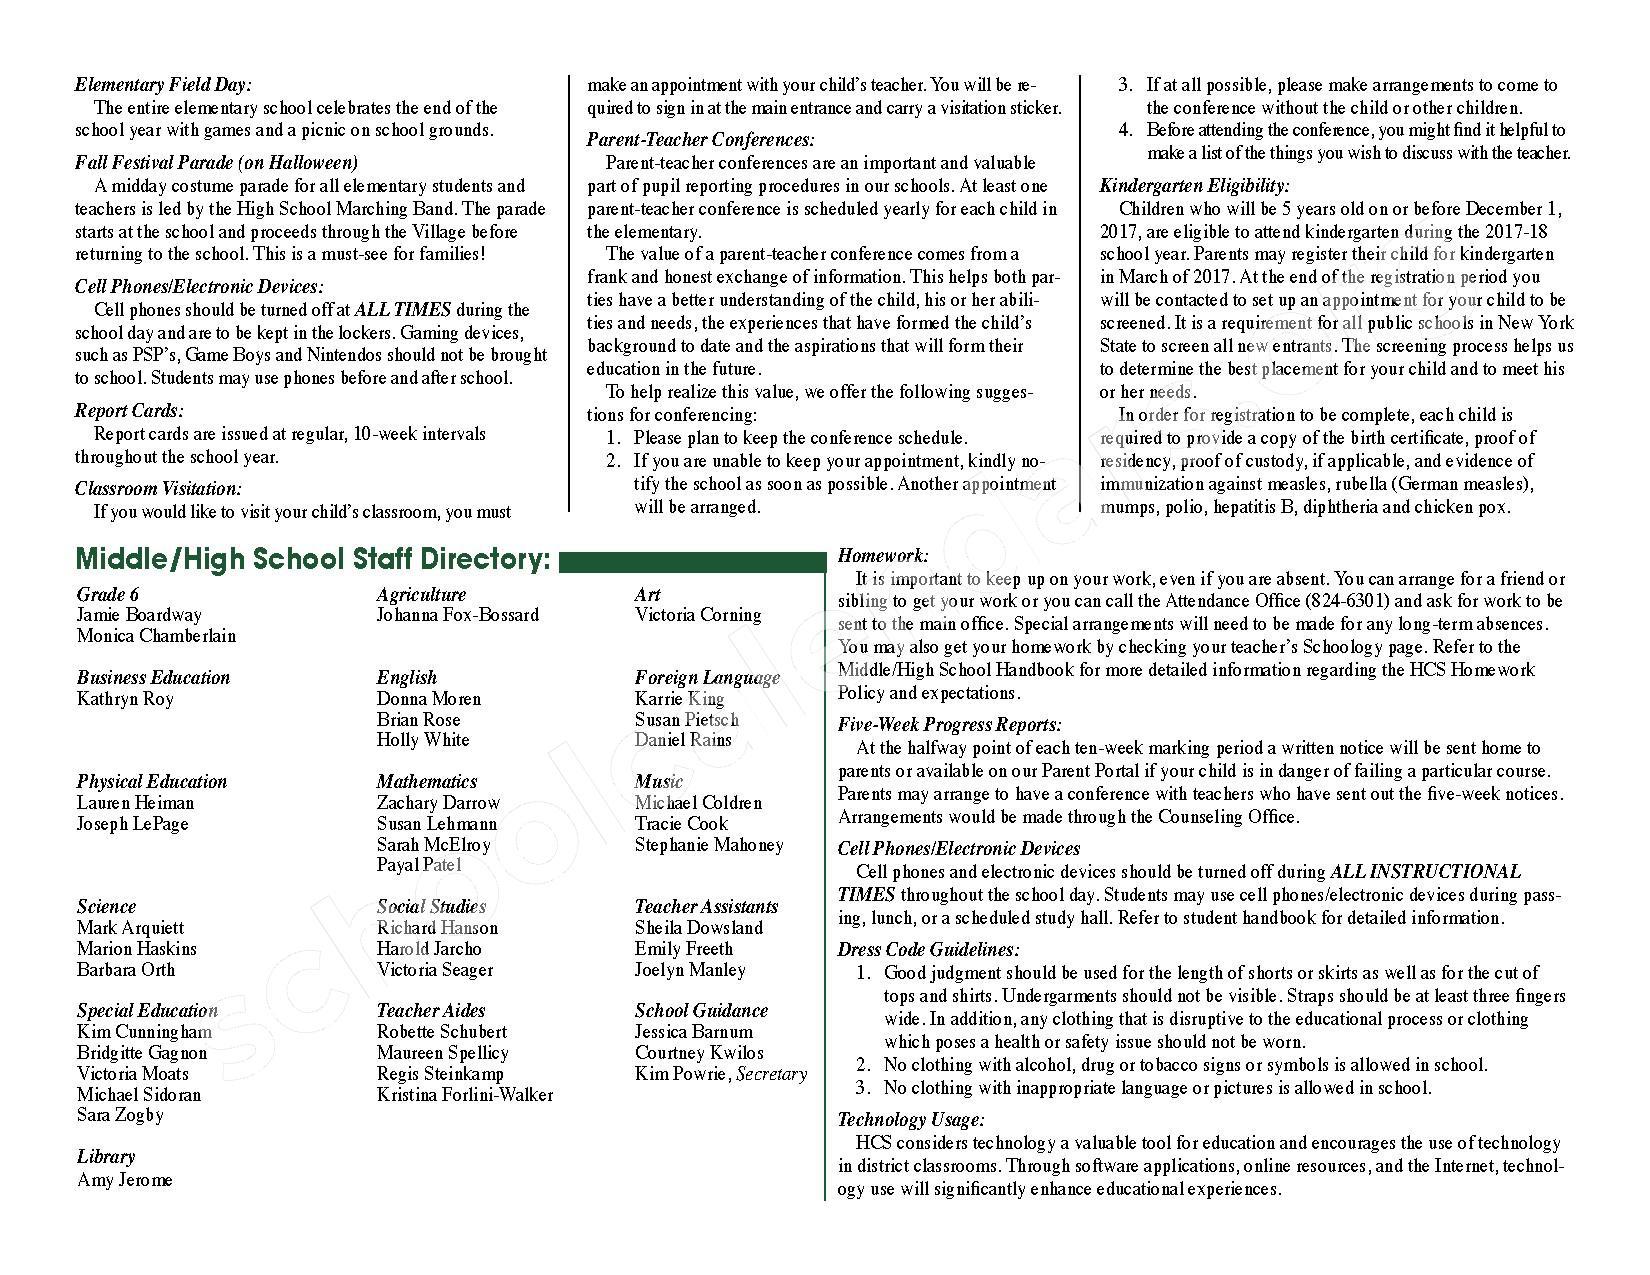 2016 - 2017 District Calendar – Hamilton Central School District – page 5